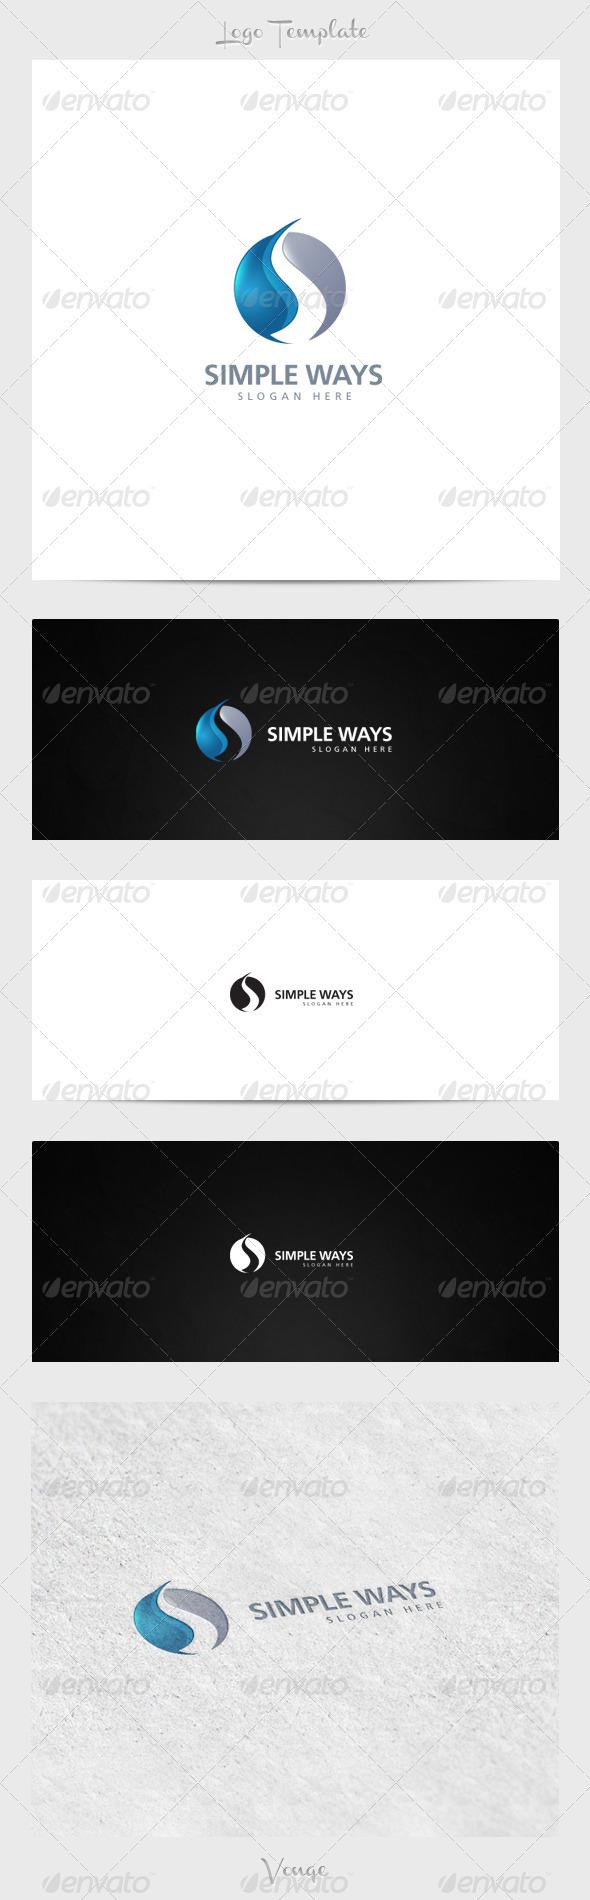 Simple Ways - Symbols Logo Templates